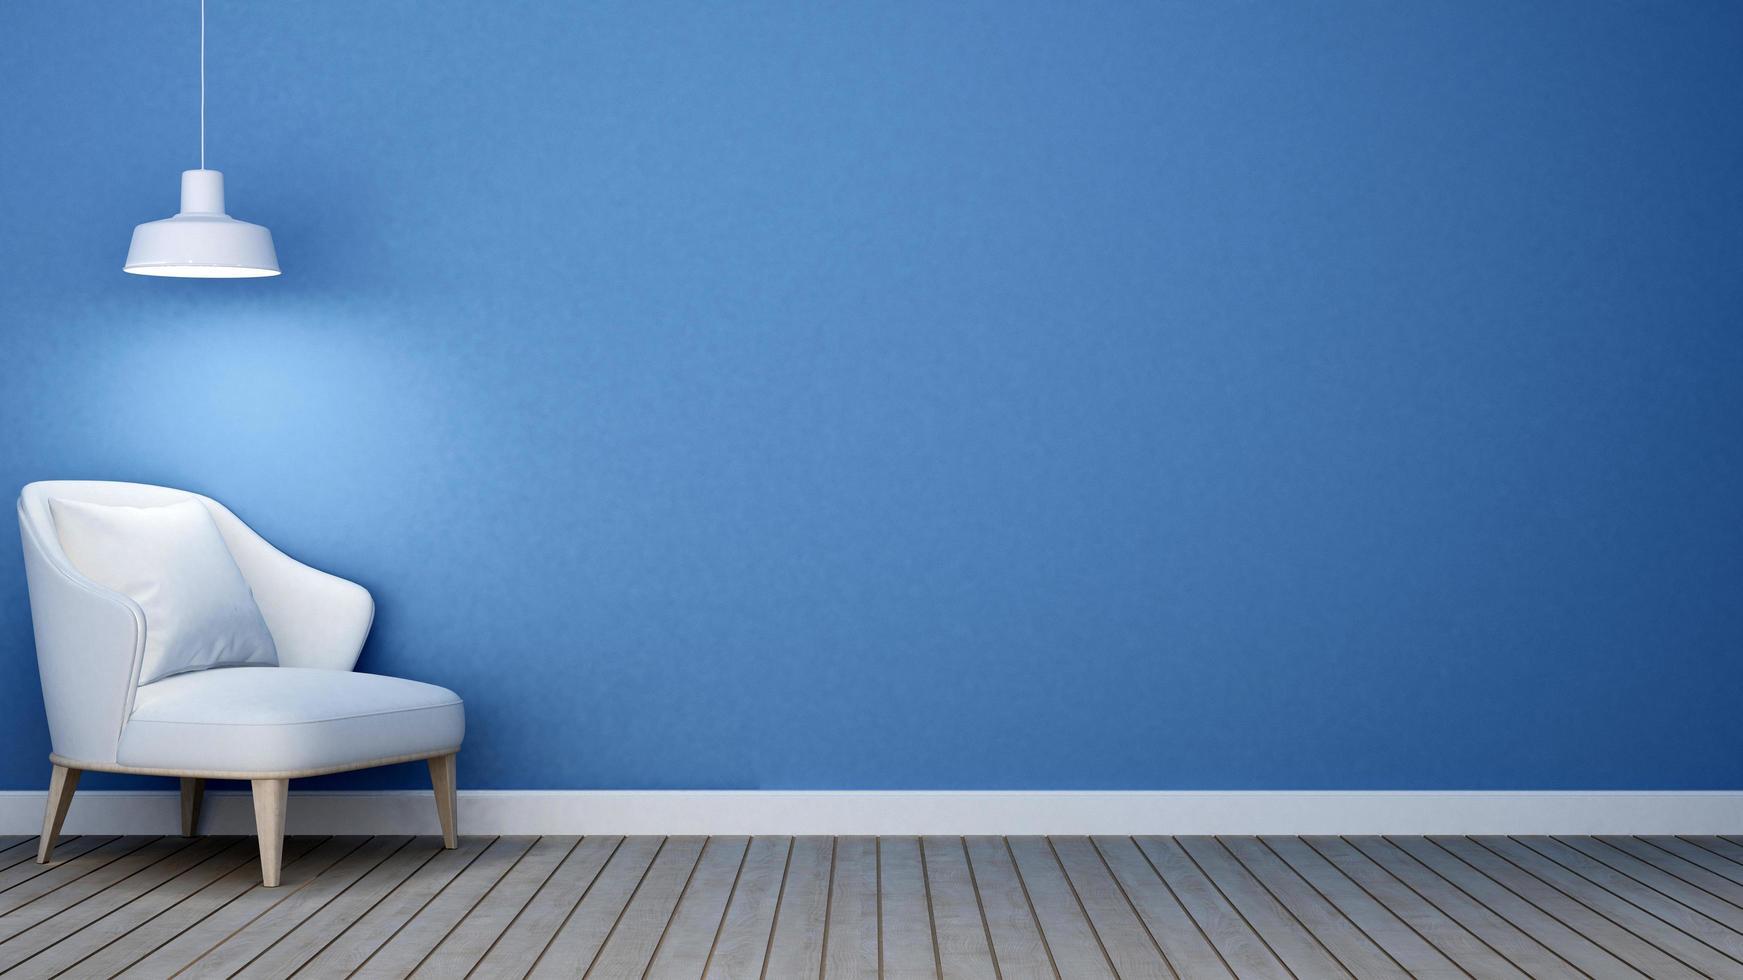 salon ton bleu en appartement ou maison photo